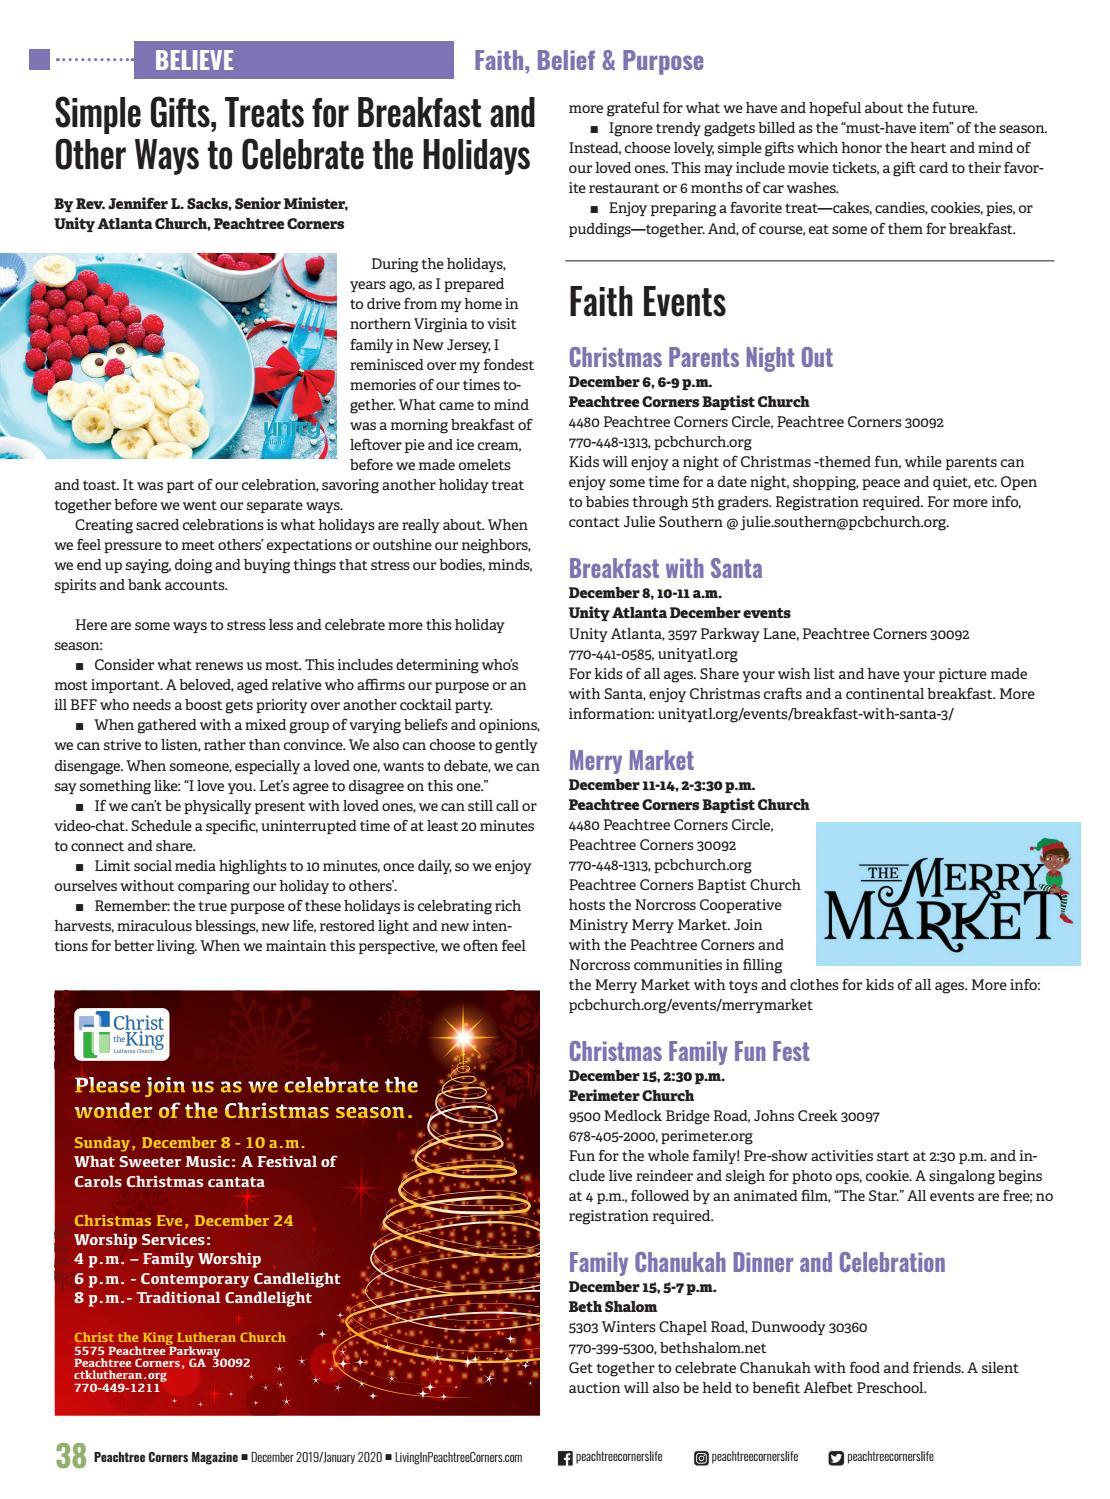 Christmas Craft Show, Dec. 8, 2020 Peachtree Corners Magazine   Dec. 2019/Jan. 2020 by Peachtree